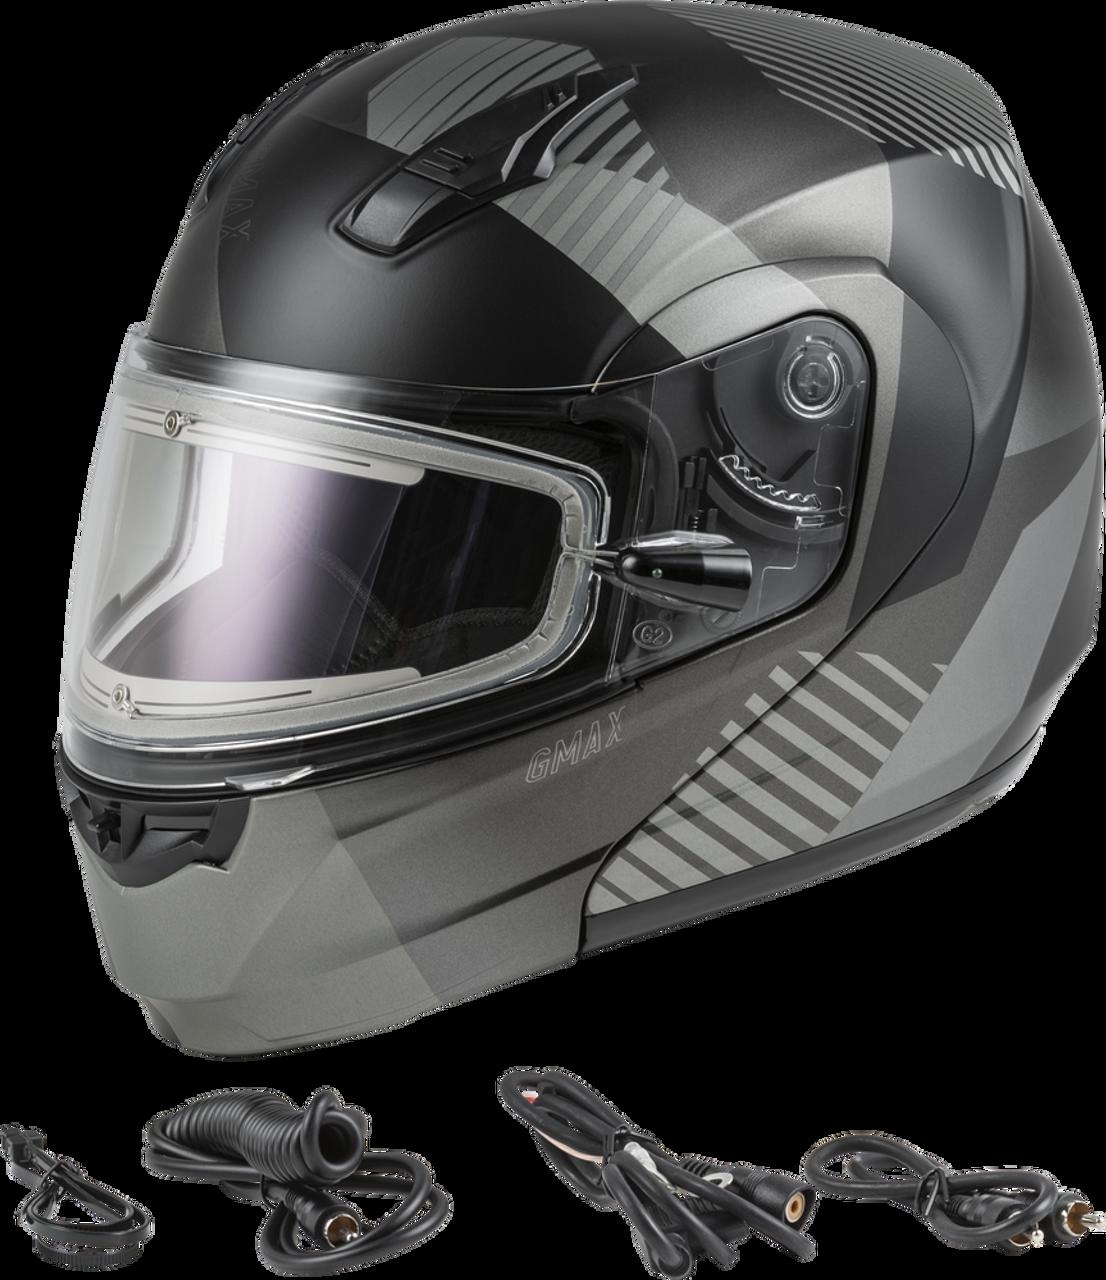 GMAX MD-04S Modular Reserve W/Electric Shield Matte Dark Silver/Black